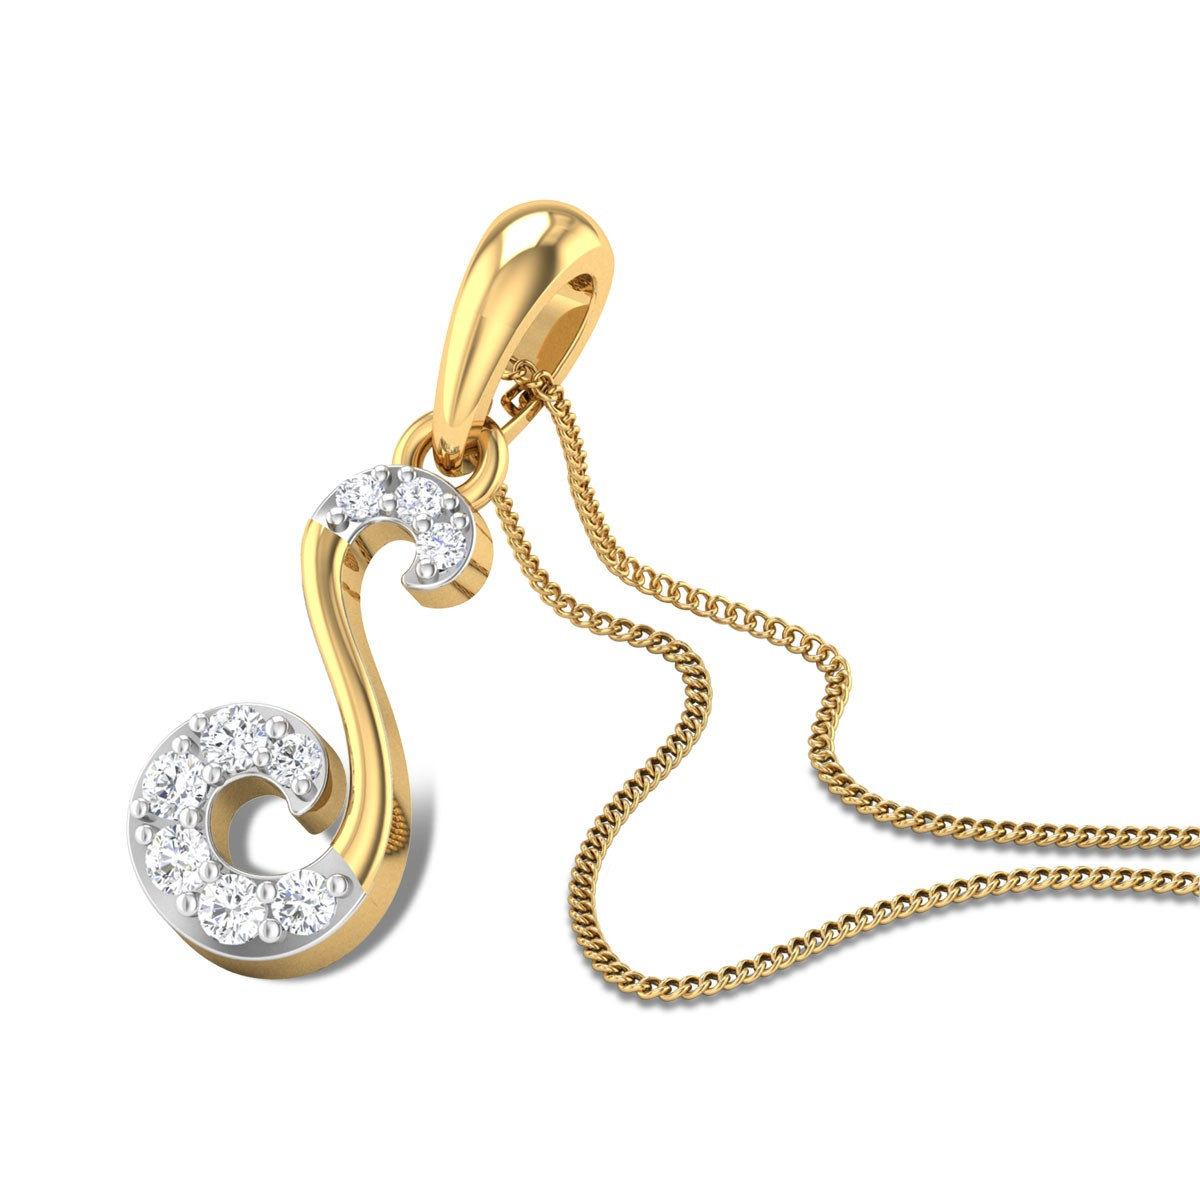 Oleander Diamond Studded Gold Pendant DJPN5196